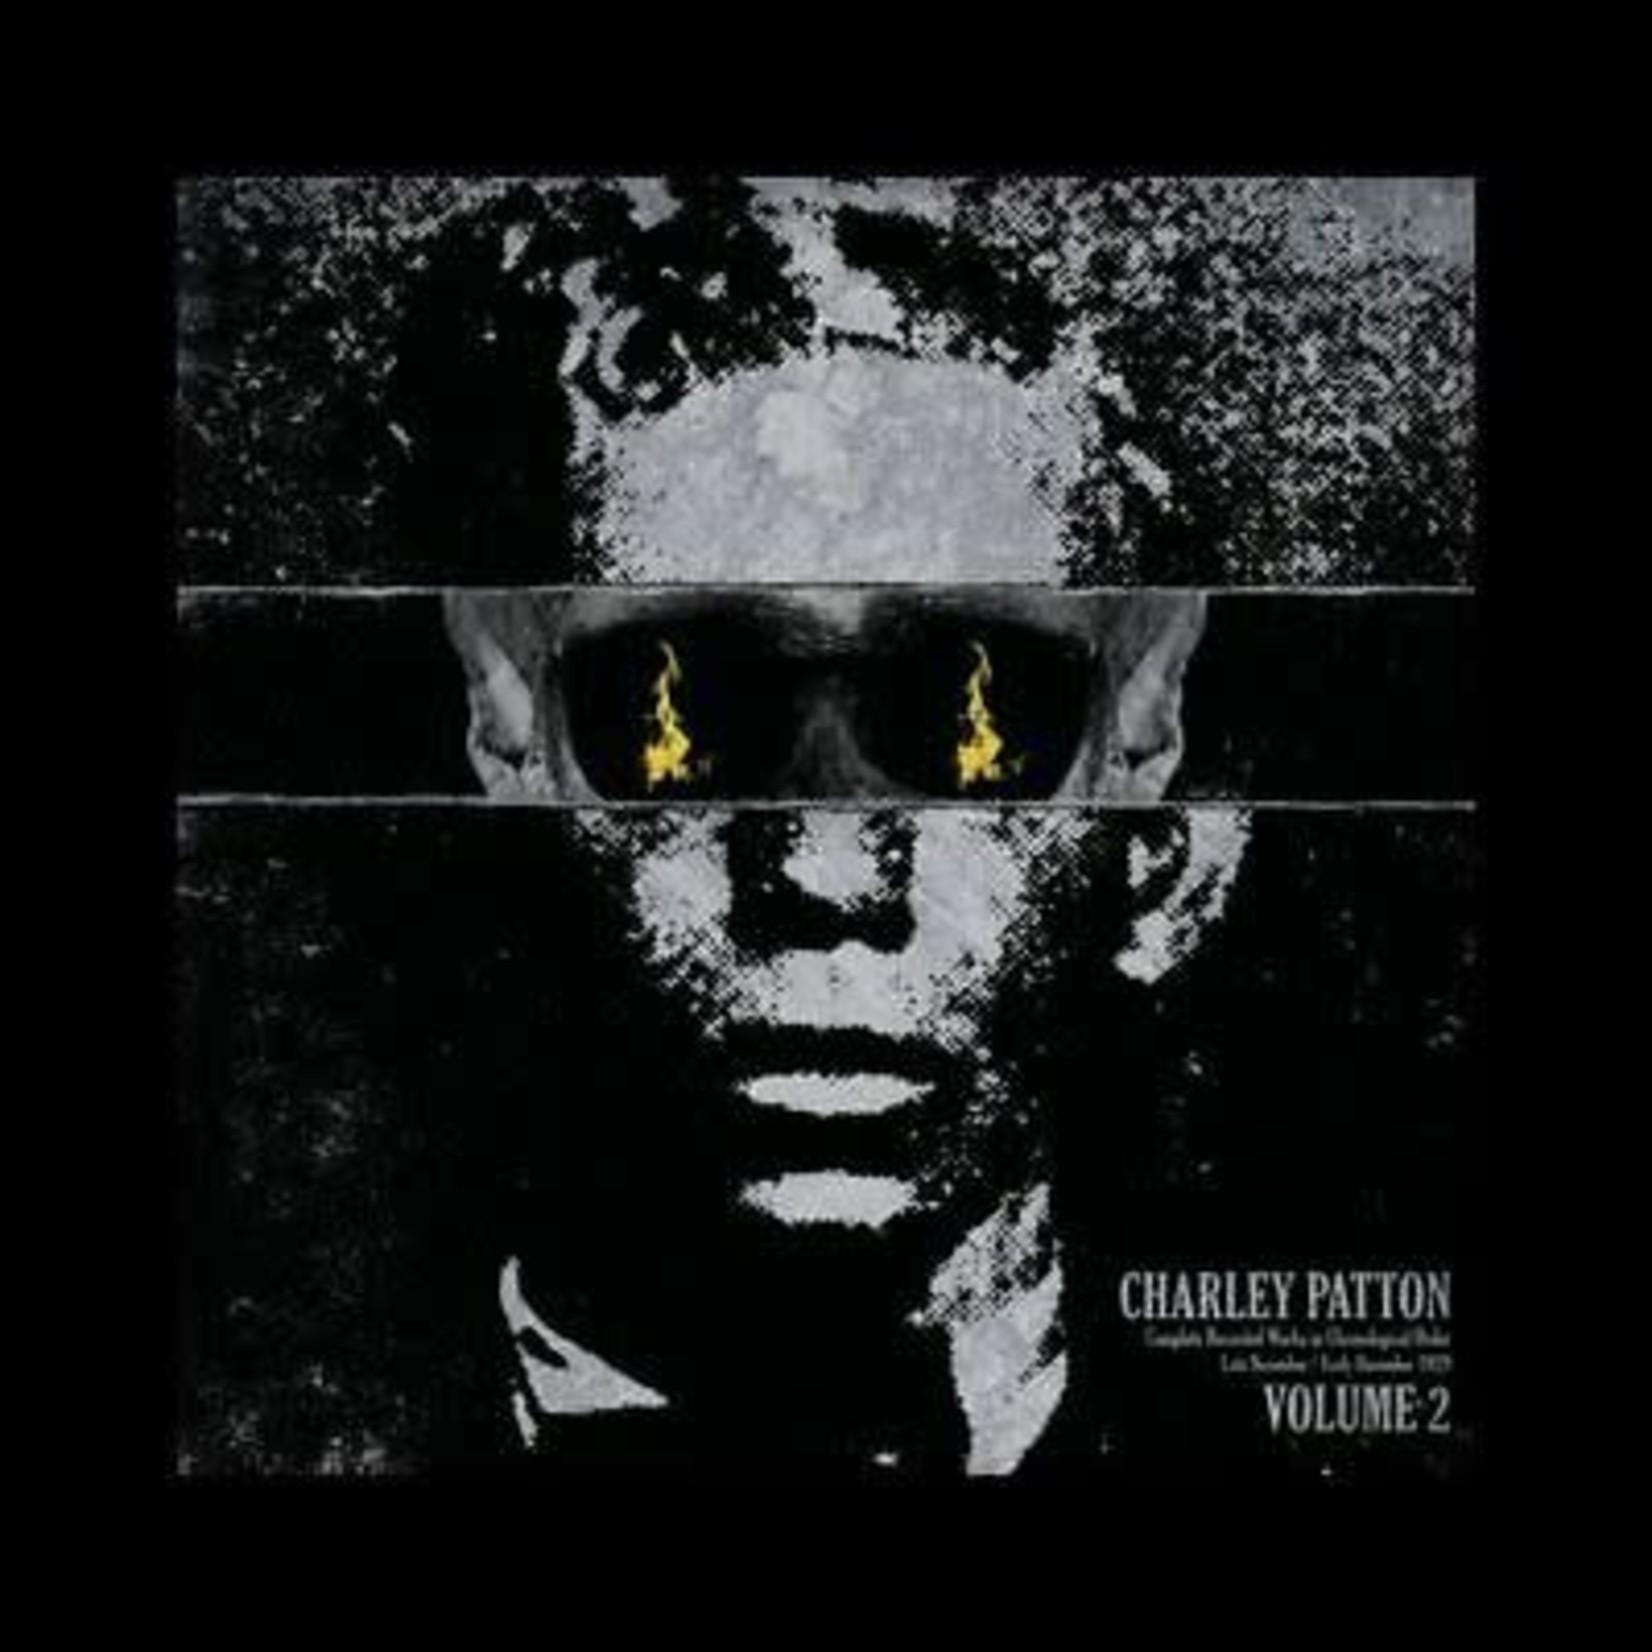 Vinyl Charley Patton - Volume 2. $$